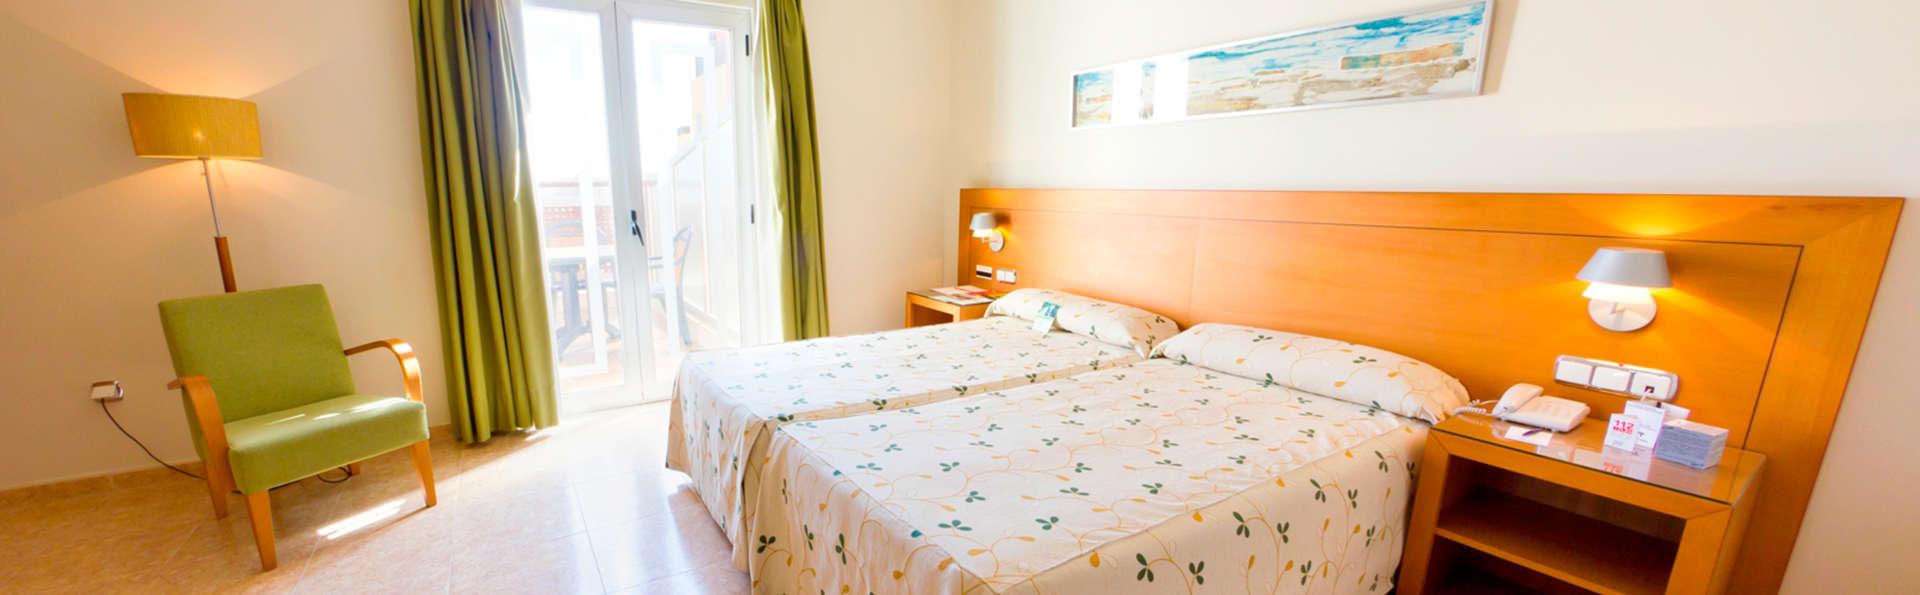 Hotel Traíña - EDIT_room.jpg